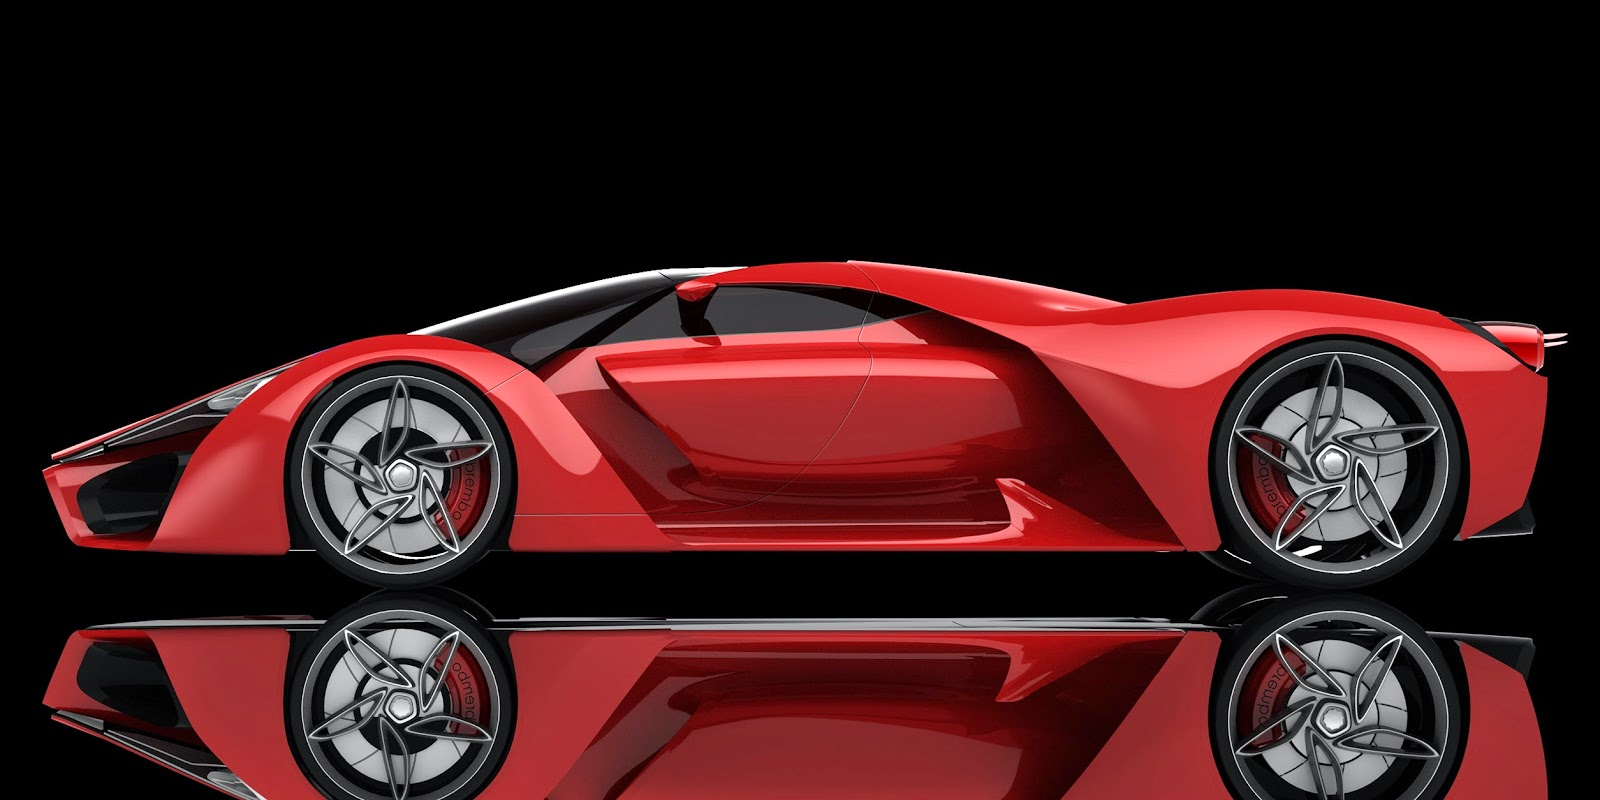 Ferrari Prepared Ferrari F80 Concept With 1 200 Horsepower